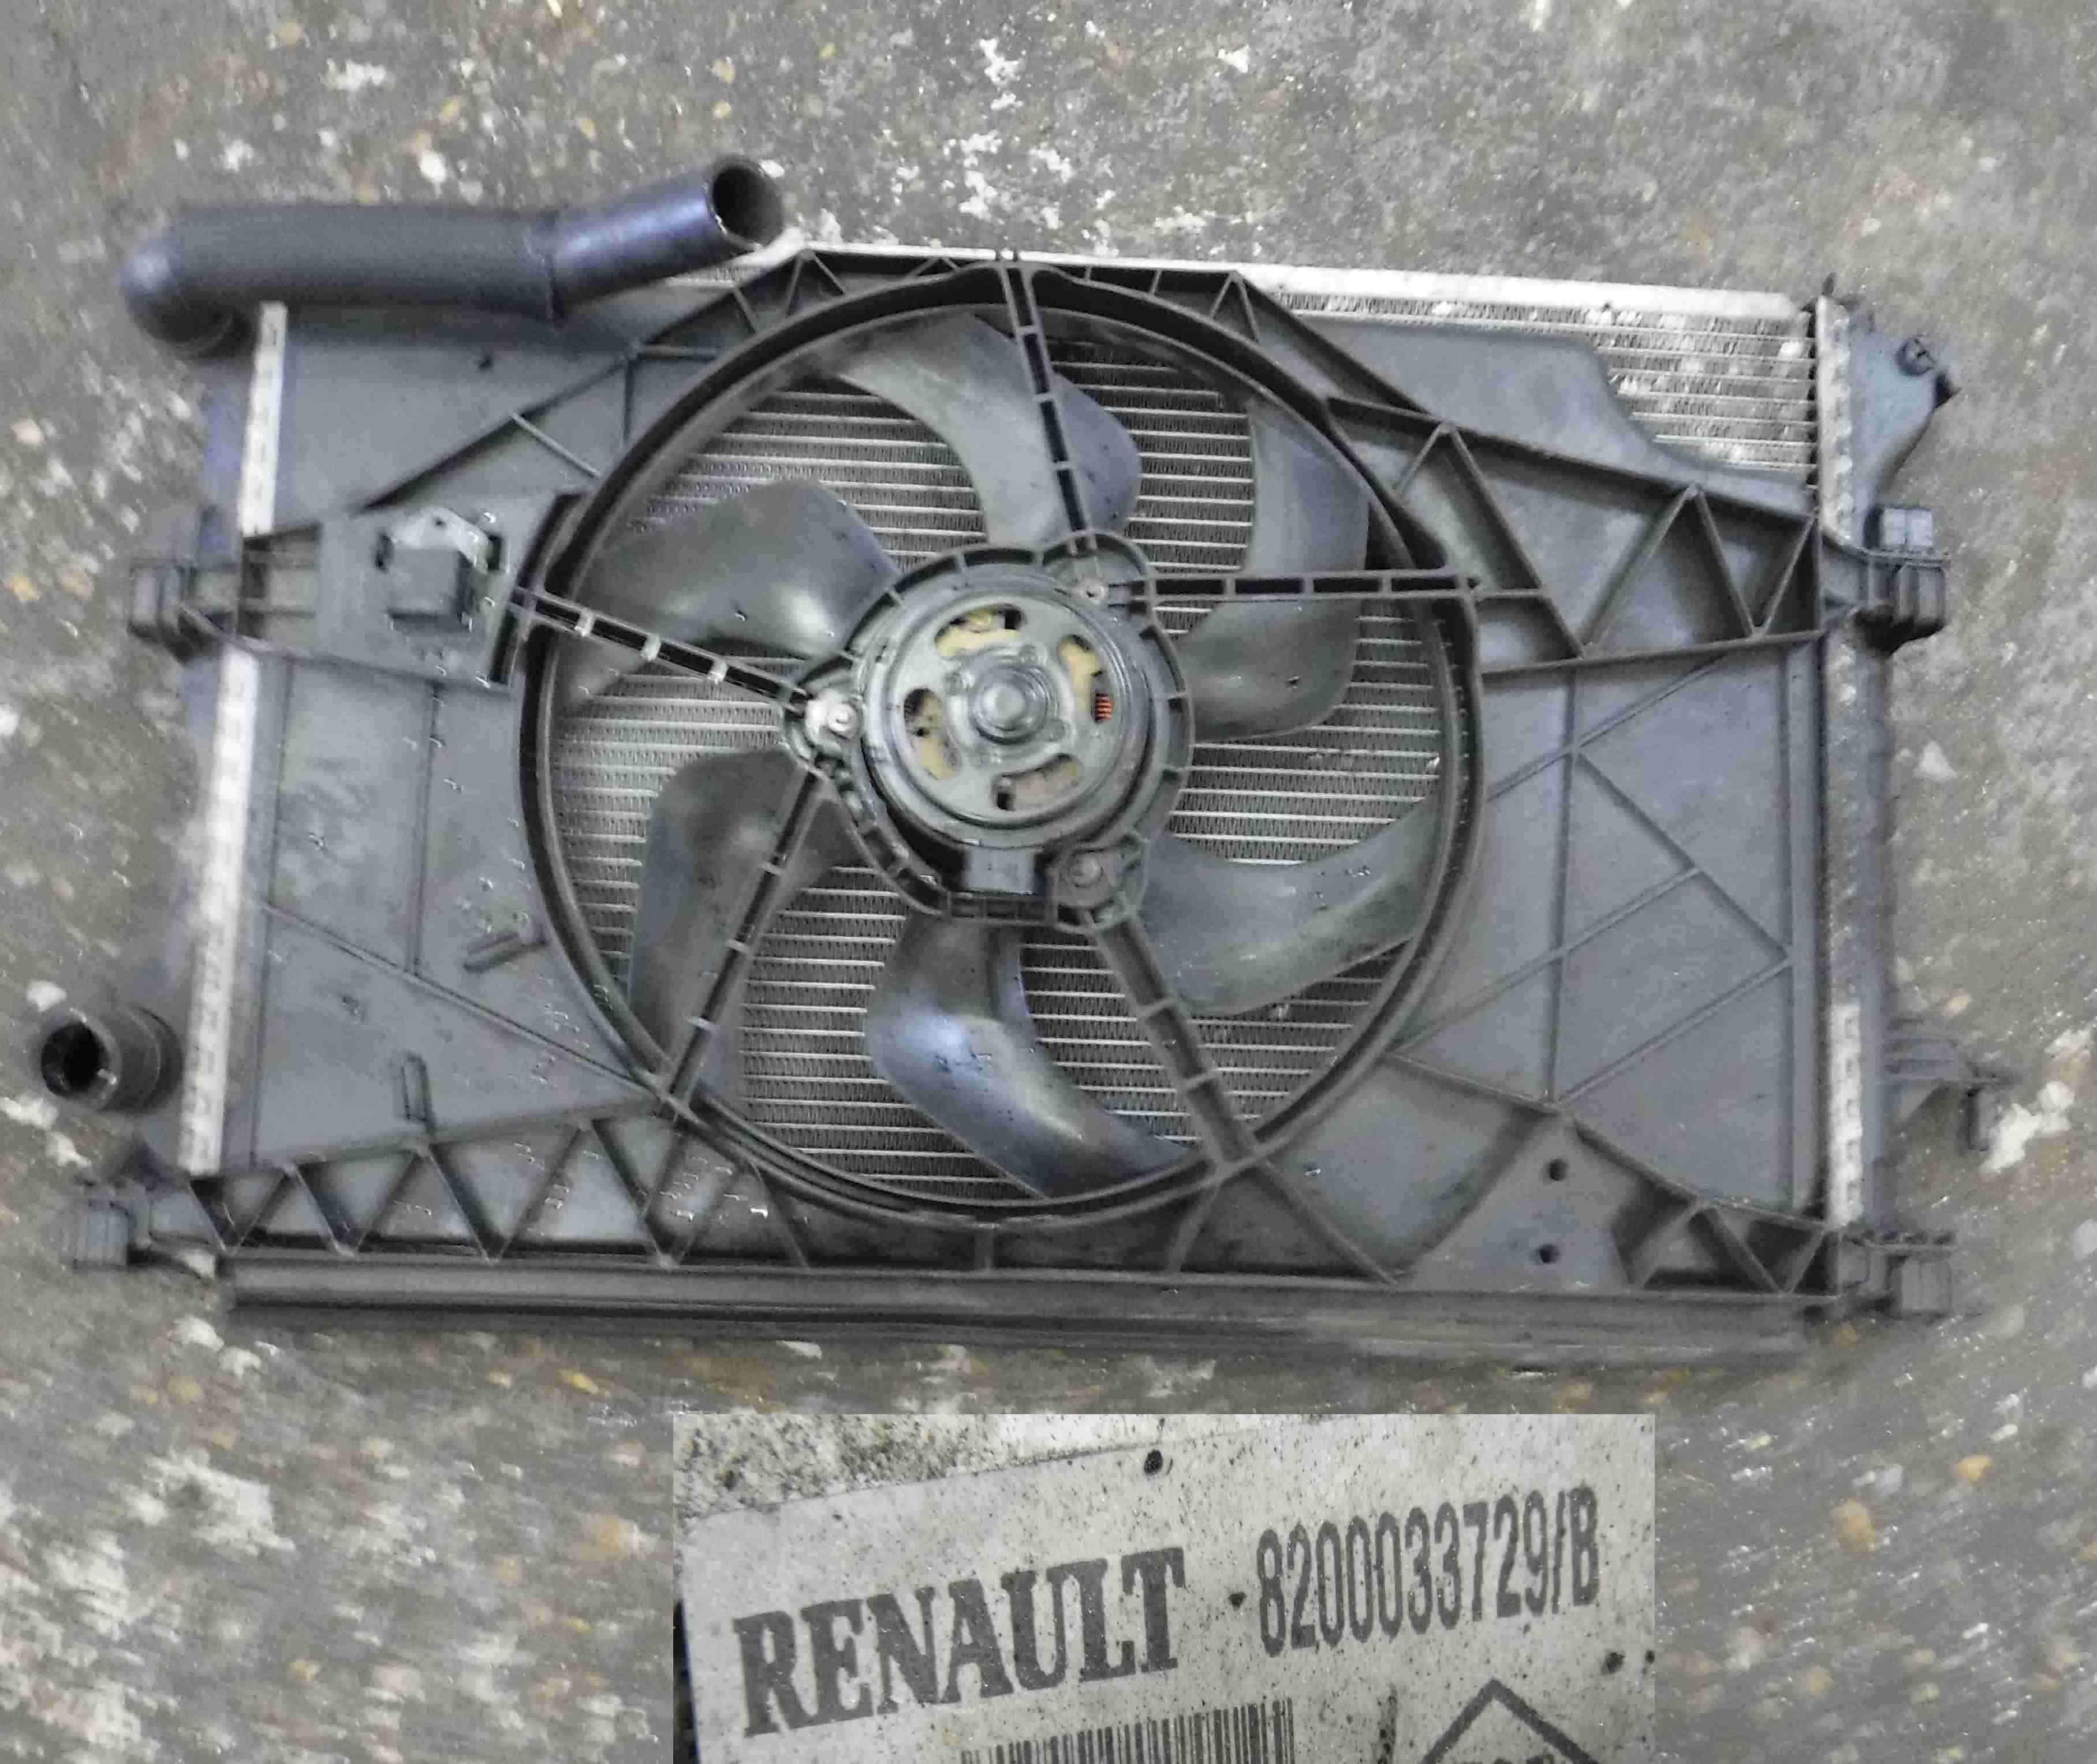 Renault Espace 2003-2013 2.2 dCi Radiator Rad Pack Fan 8200033729